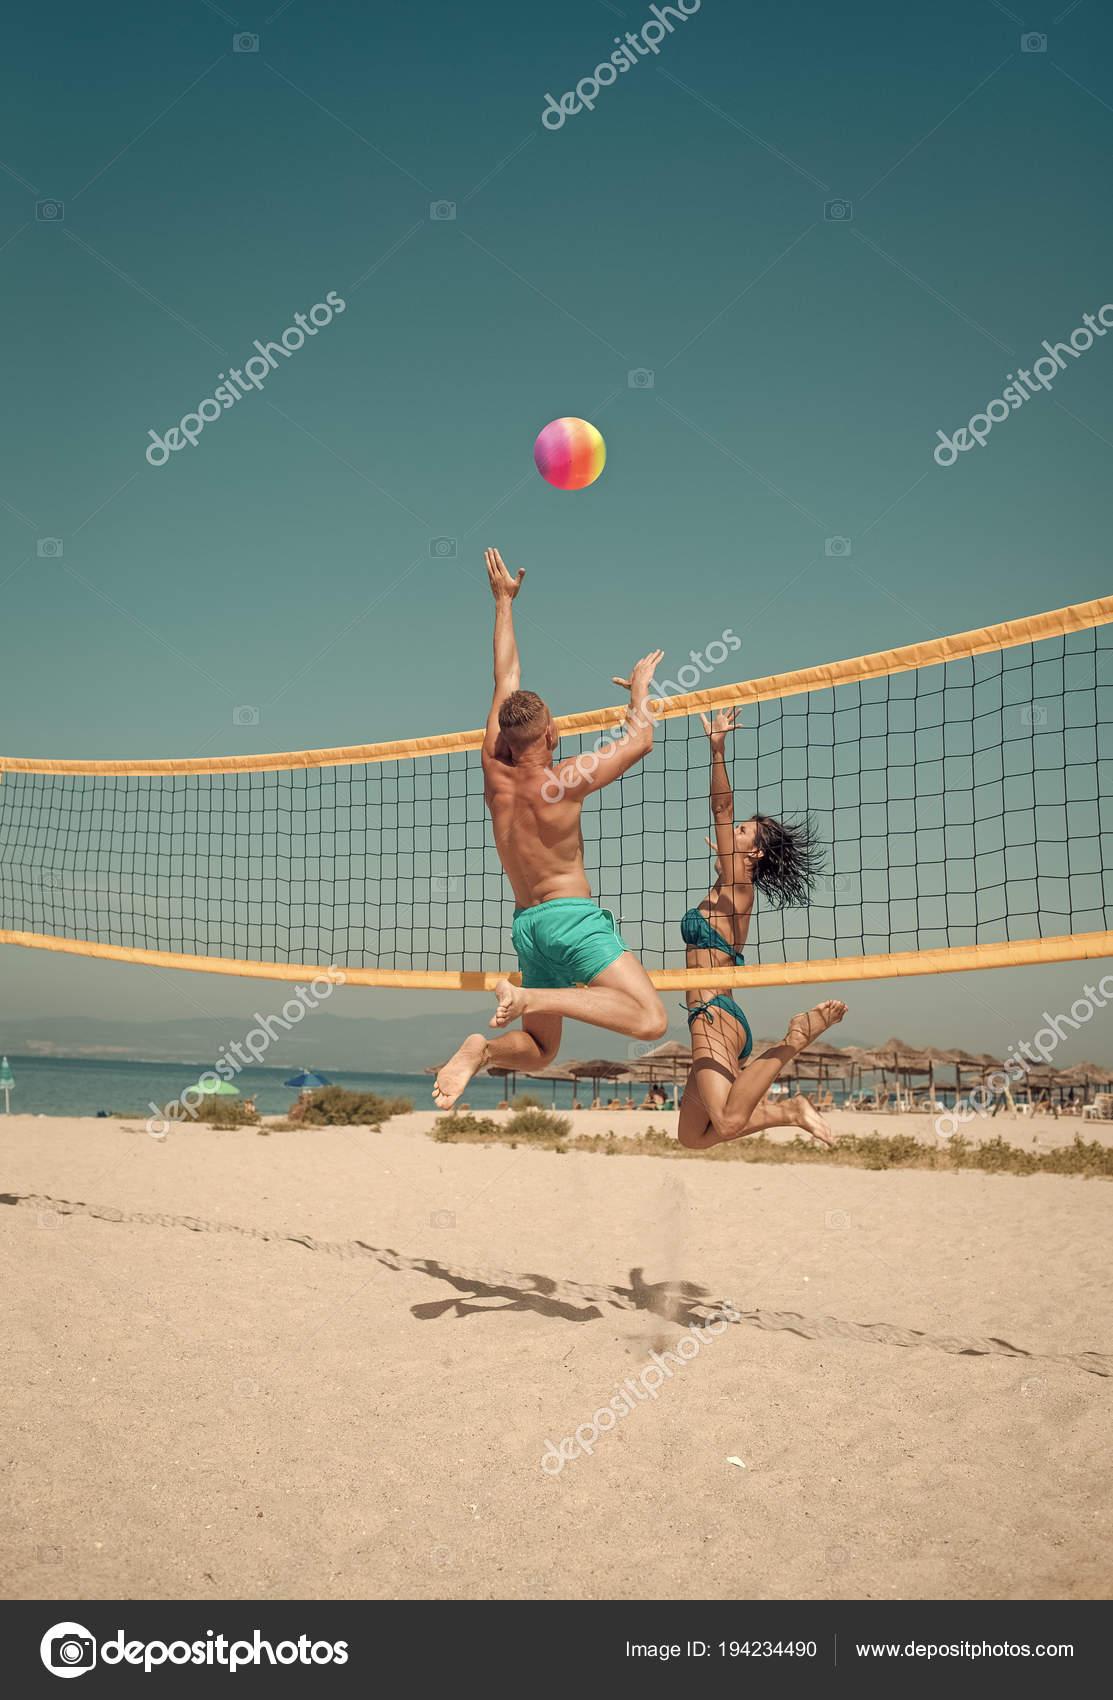 77ff6089e26e2 Par divertirse jugando voleibol. Joven pareja activo deportivo bata de voley  ball